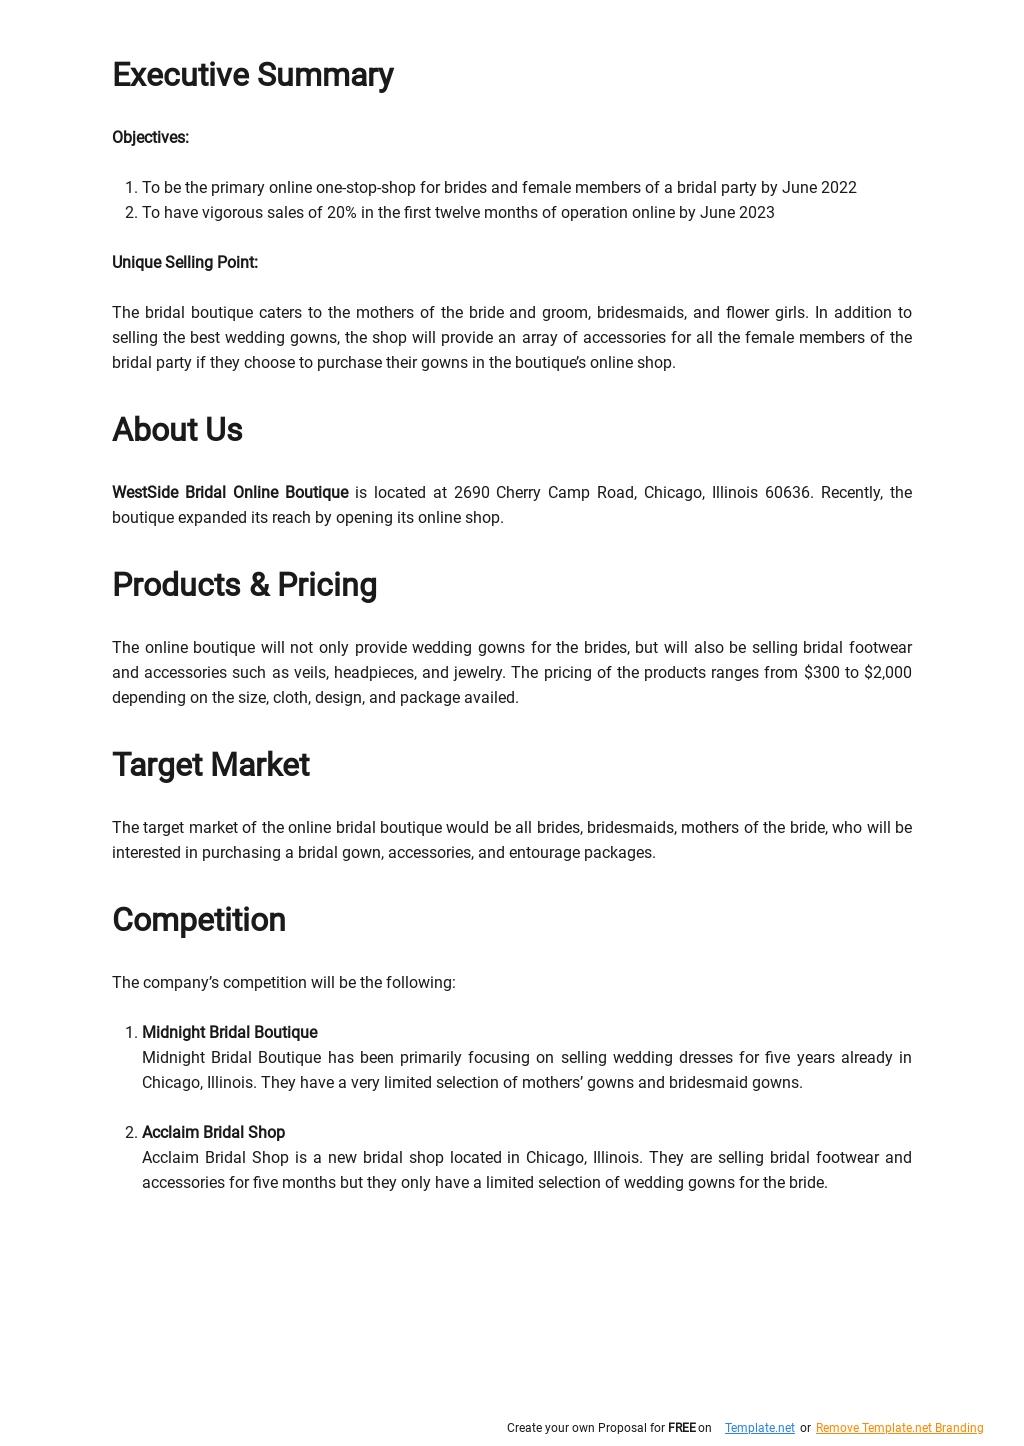 Online Boutique Business Plan Template 1.jpe